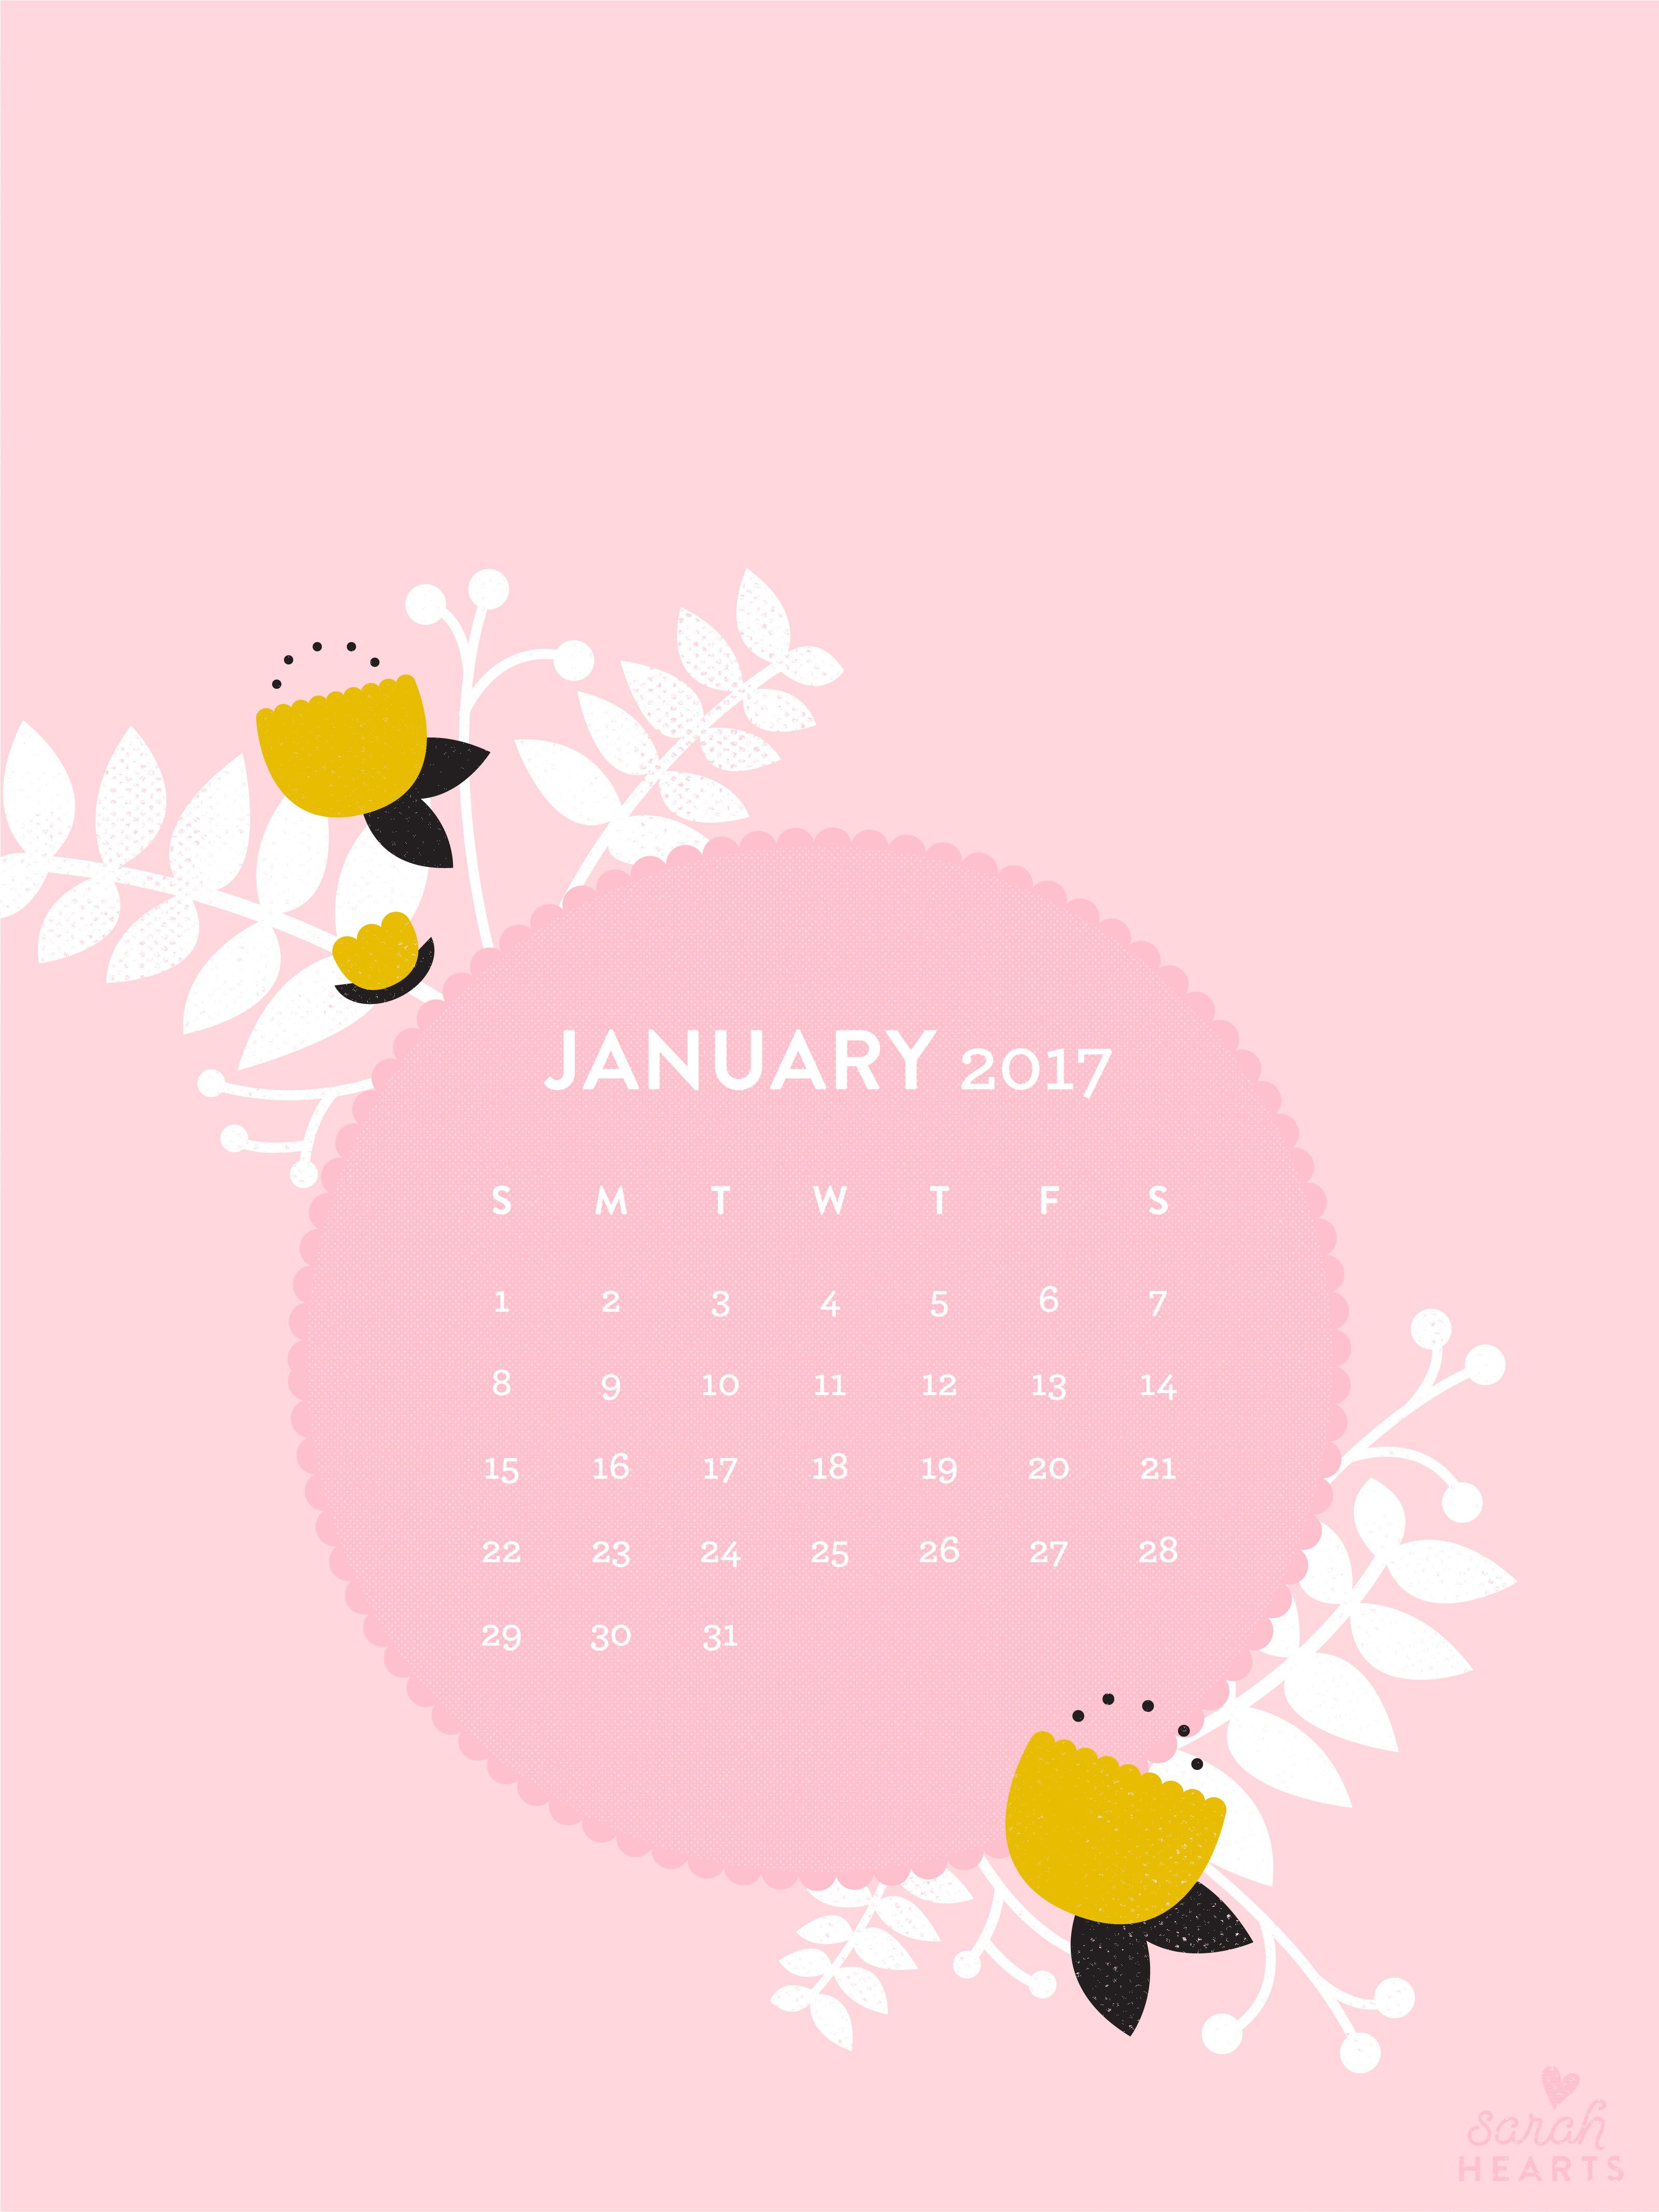 Calendar Wallpaper January 2017 : January calendar wallpaper sarah hearts